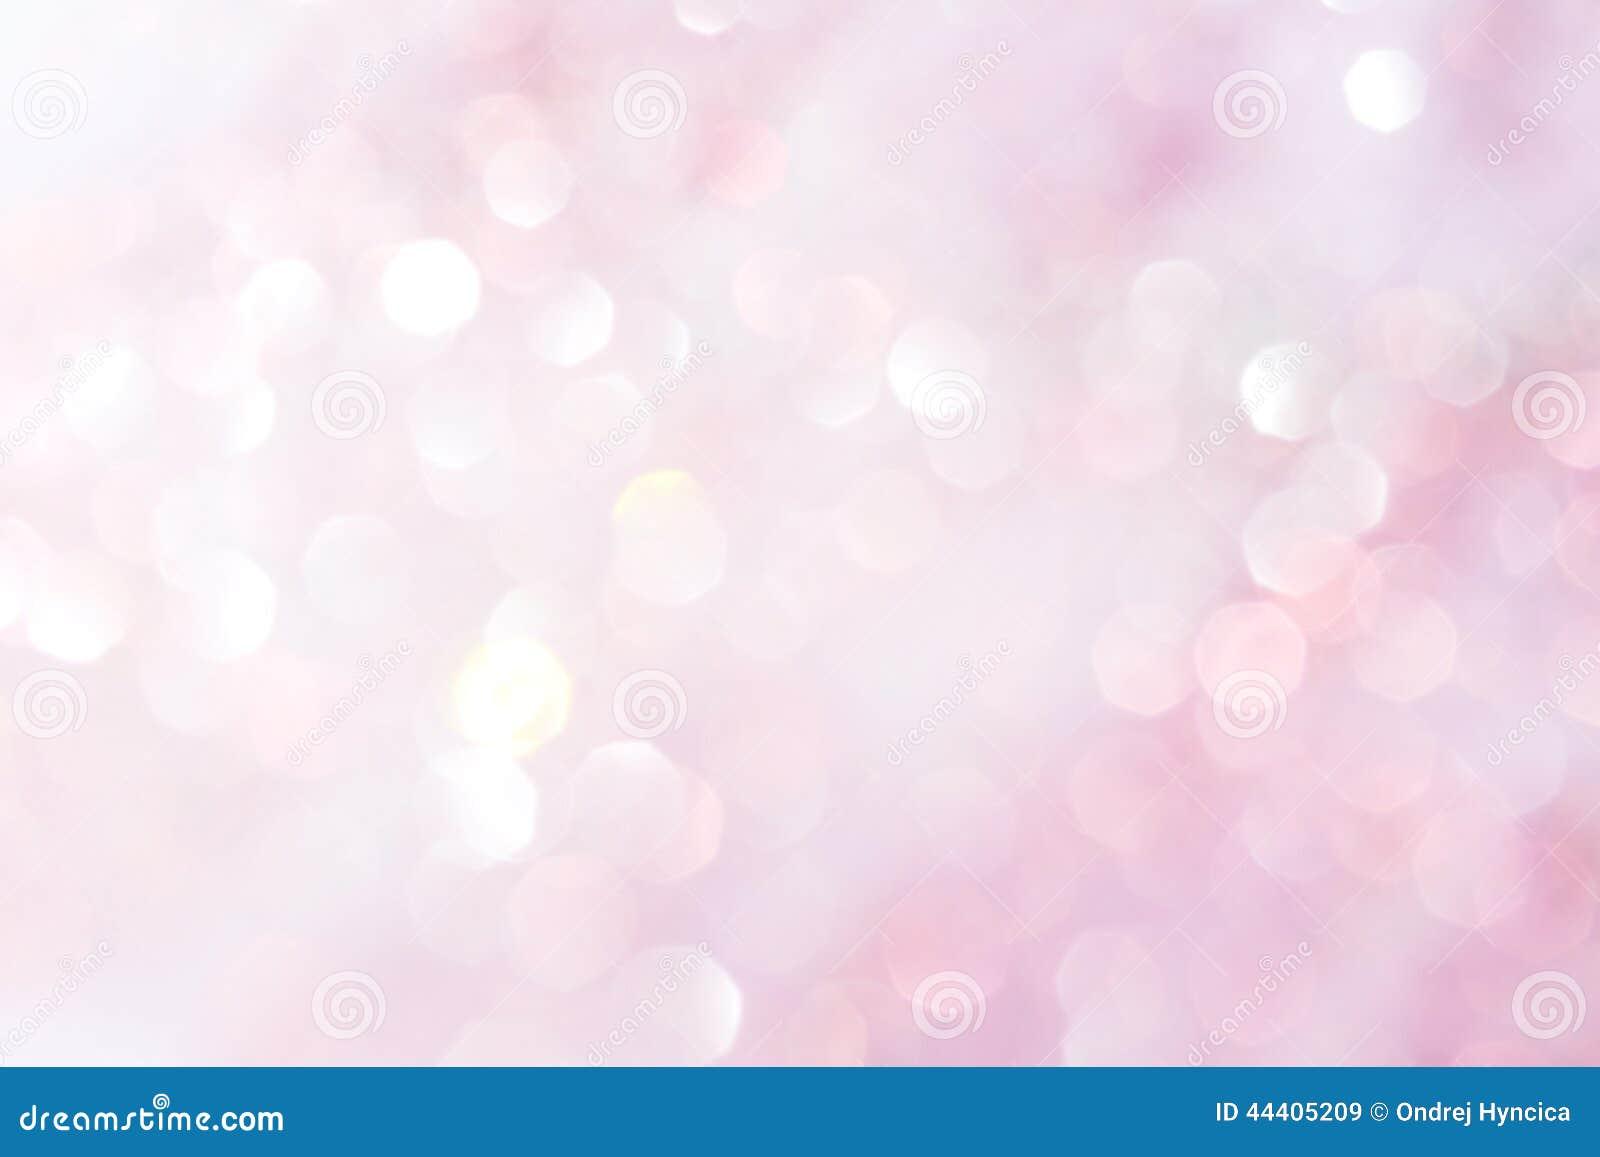 Puple和白色柔光抽象背景